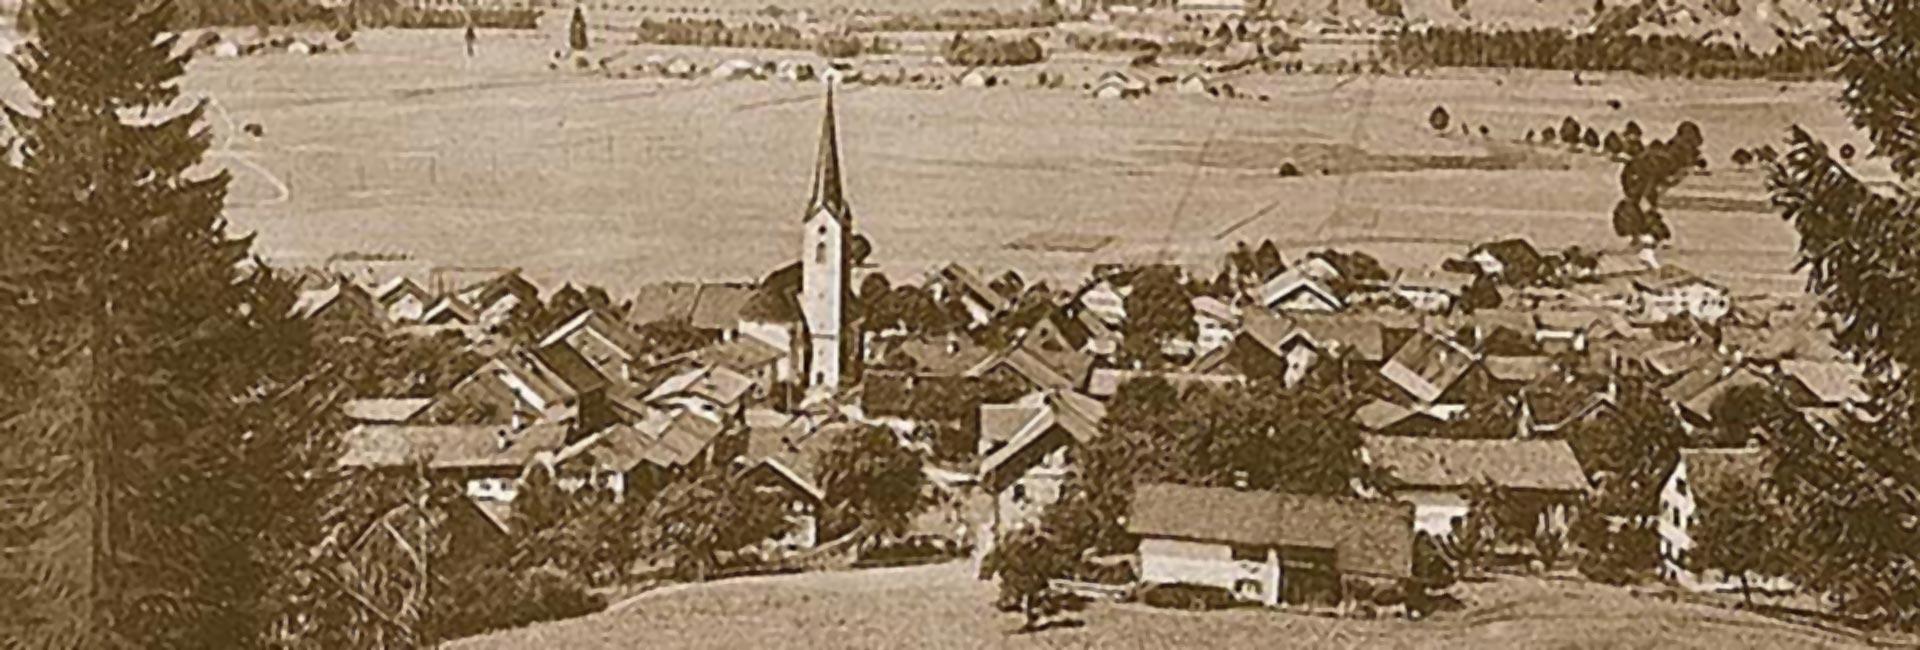 Historie Burgberg im Allgäu